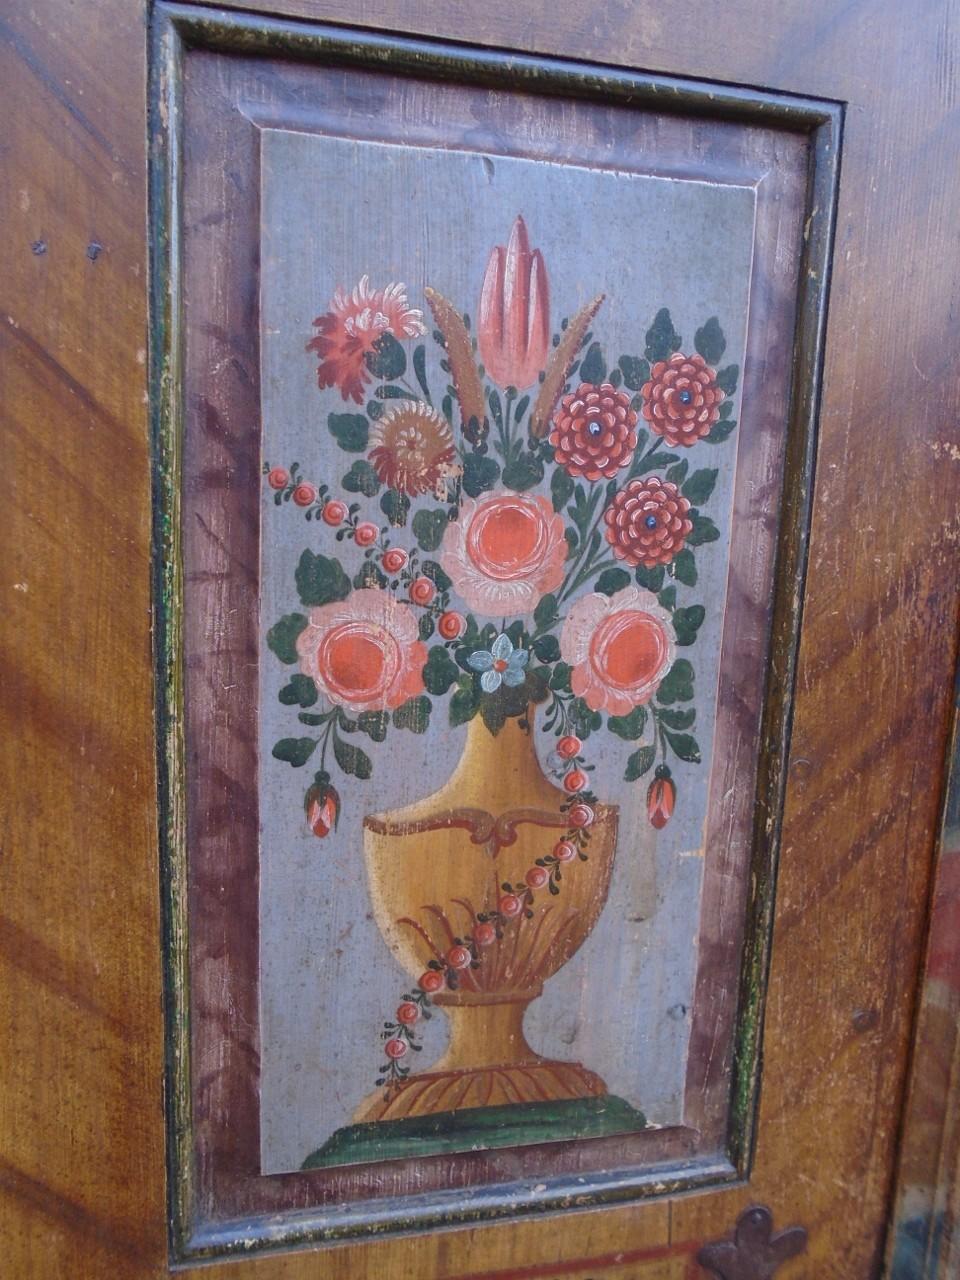 ... . Stiria (A)  Antichità Evelina - Vendita mobili antichi tirolesi